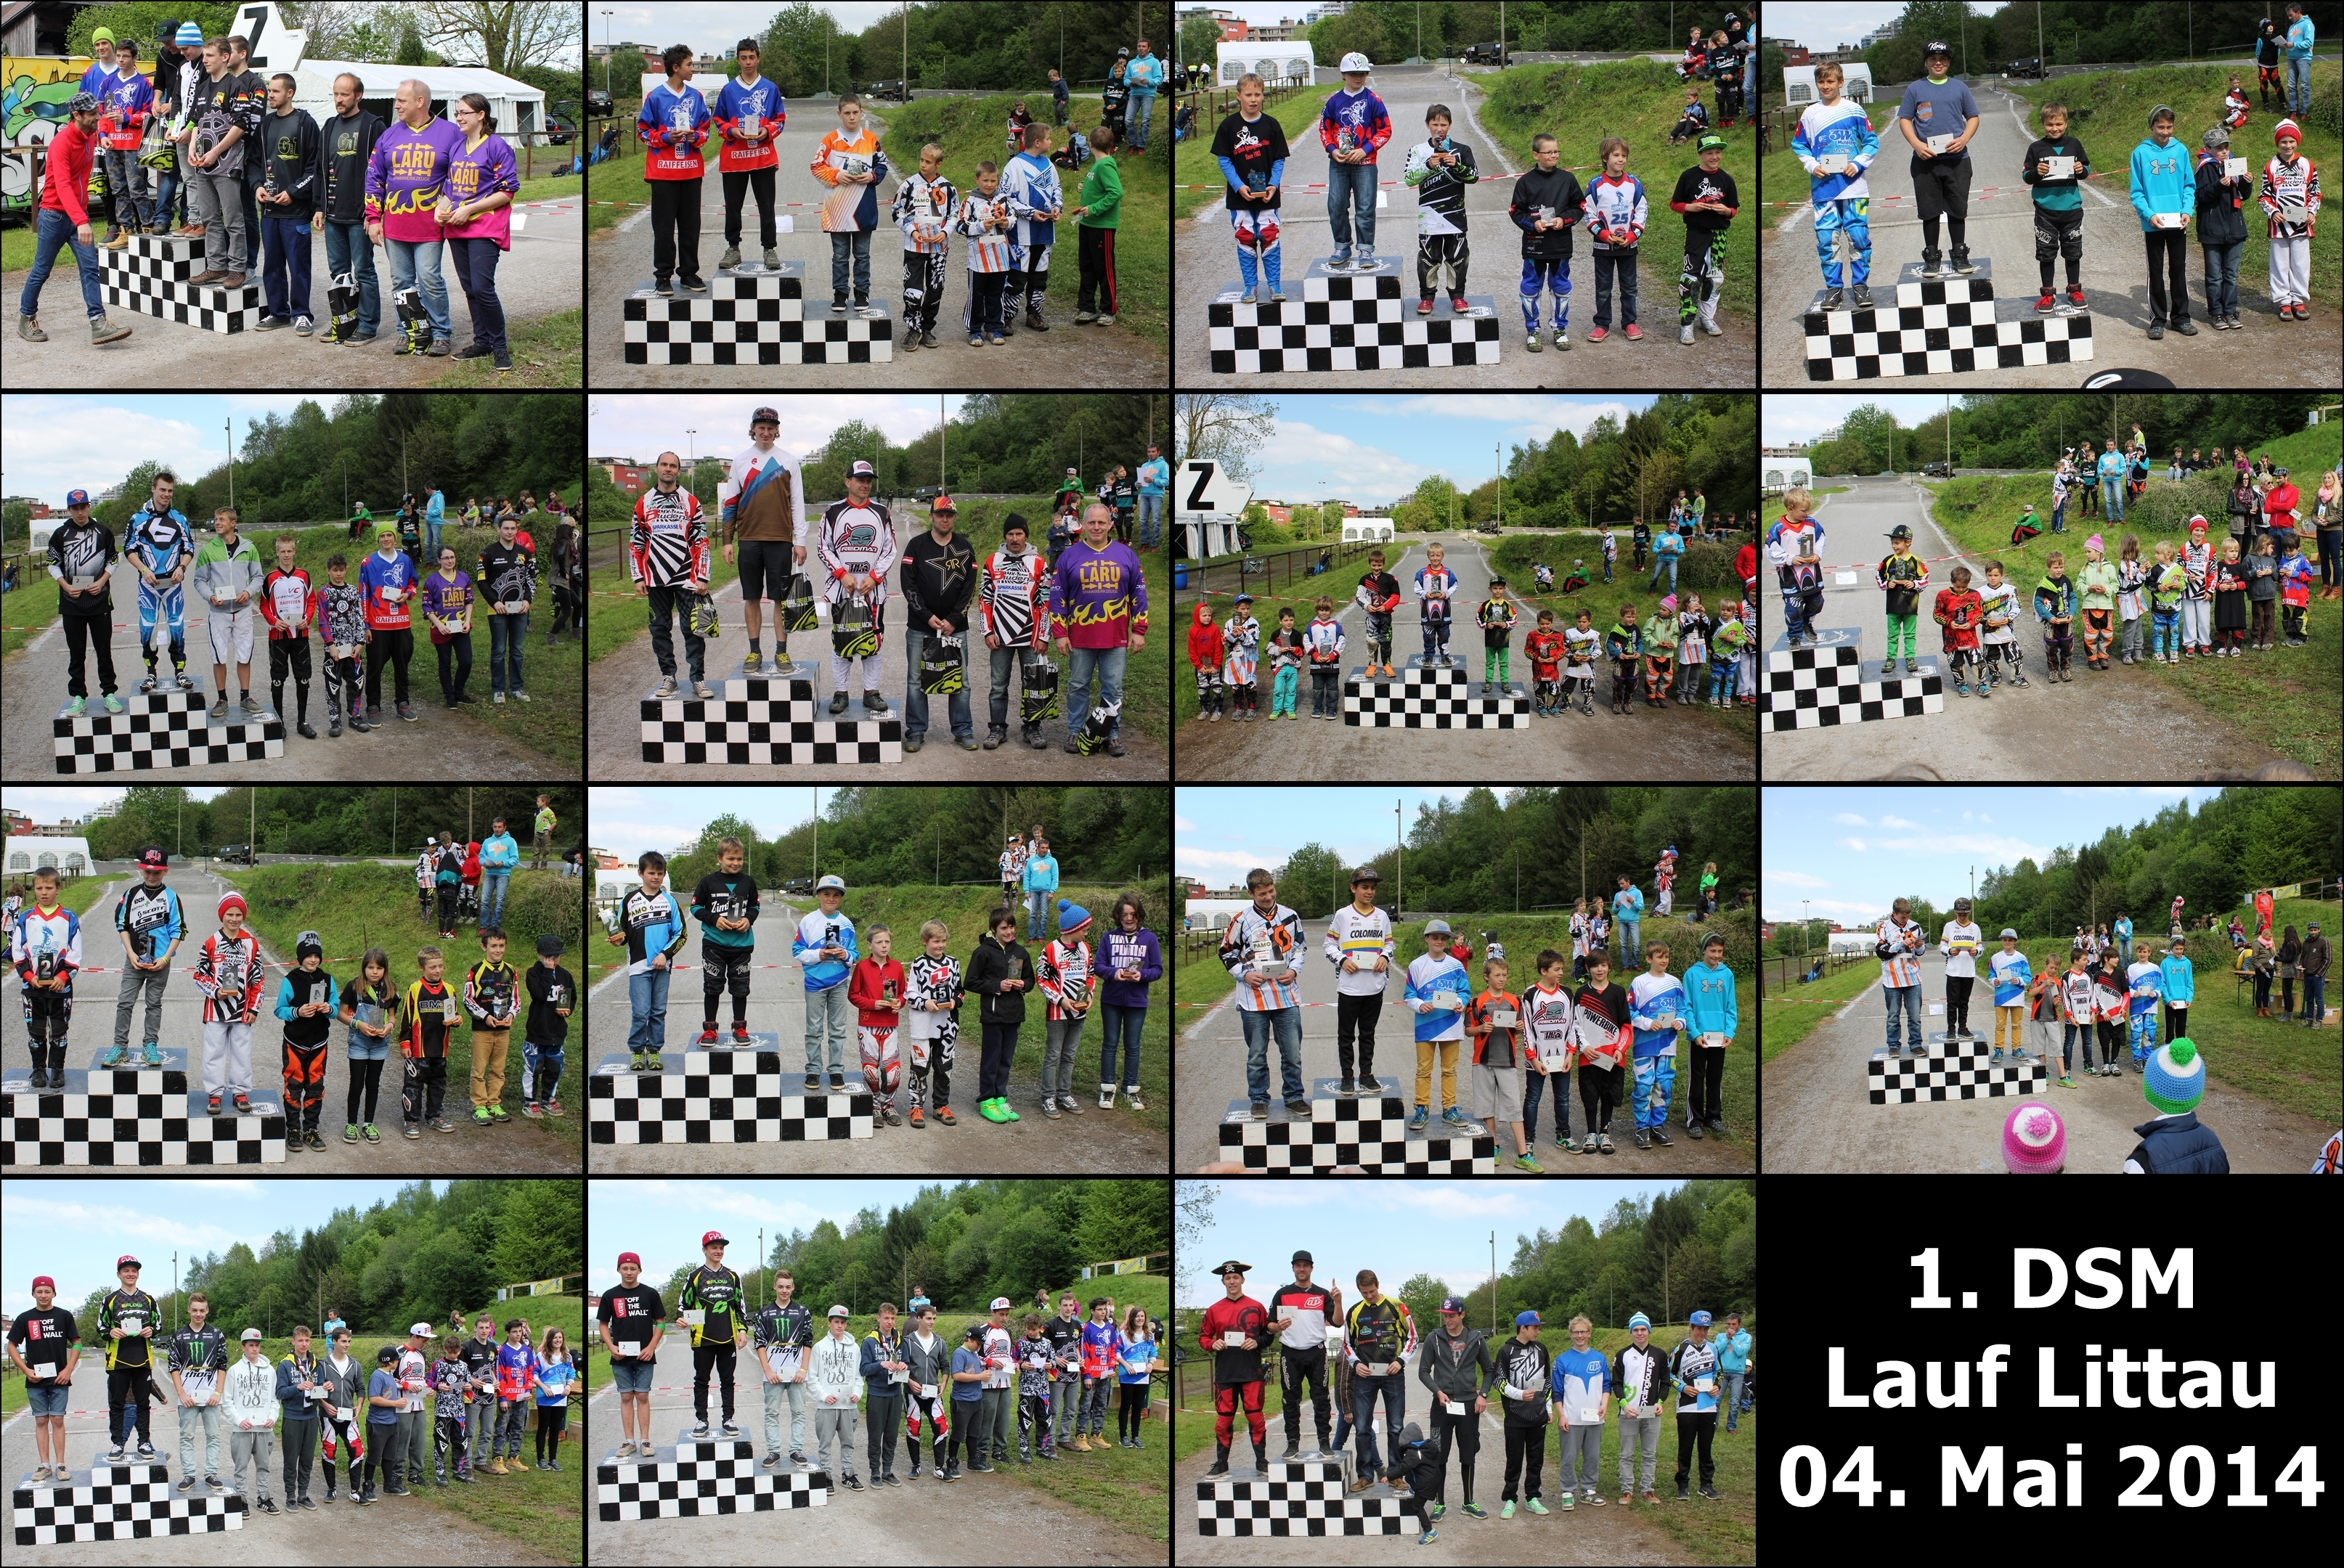 1. DSM-Lauf in Littau 04.05.2014